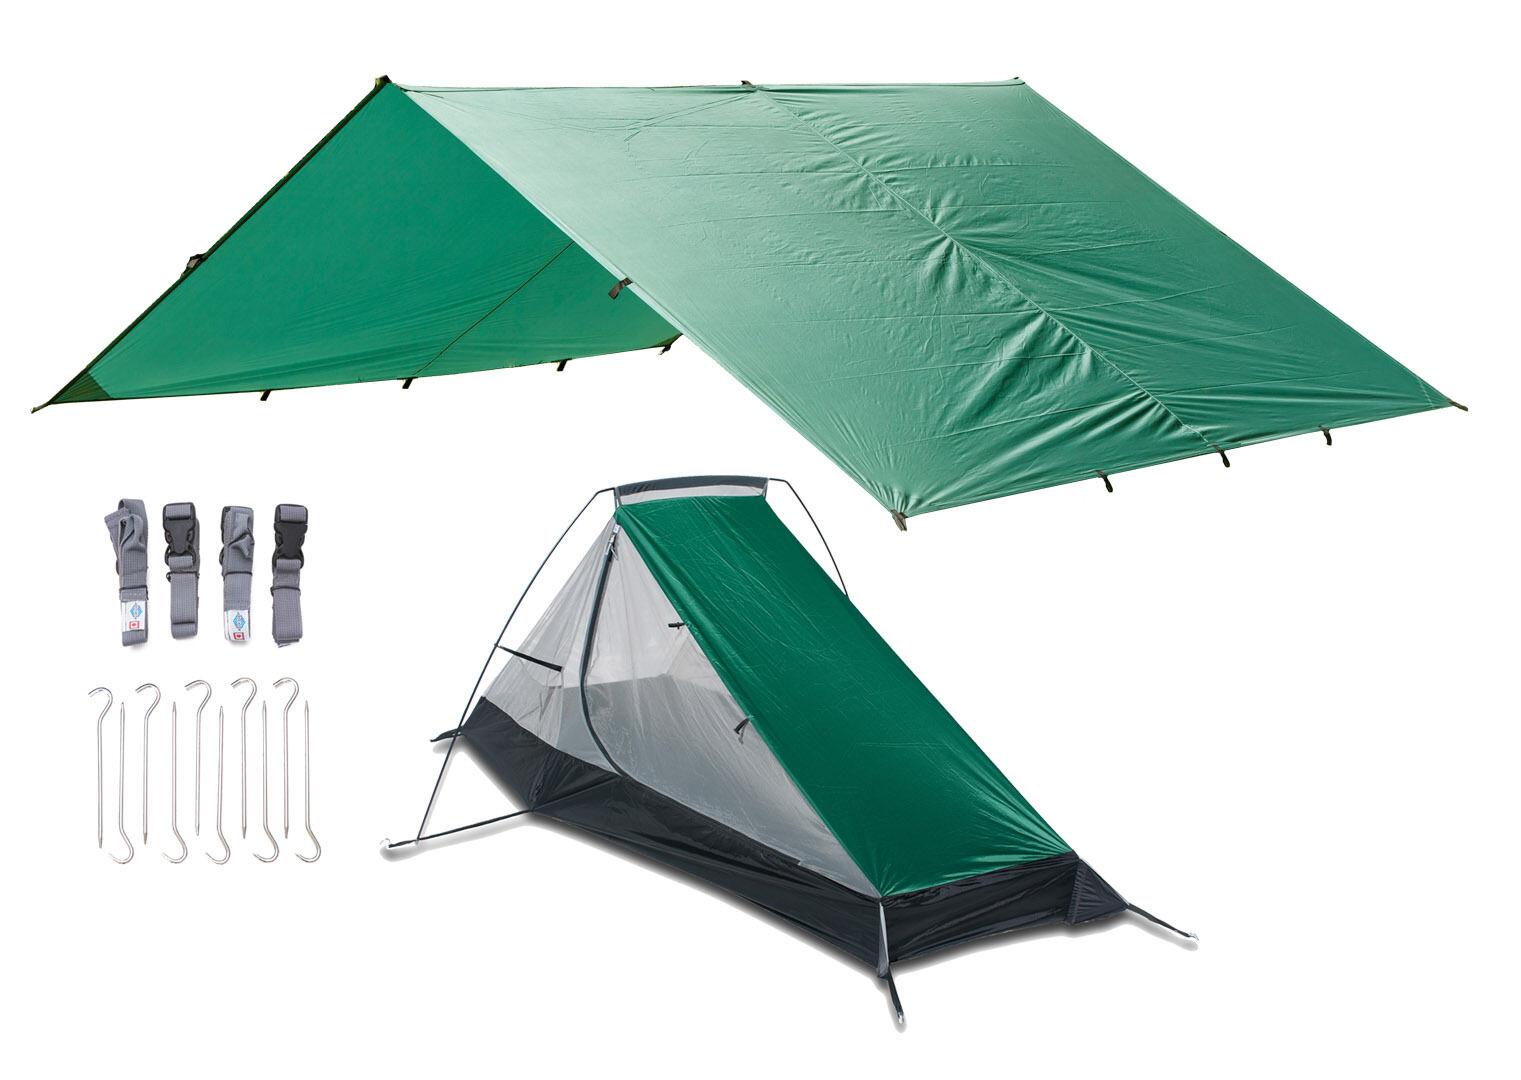 Aqua Quest West Coast Combo - 100% Waterproof Tarp + Bivy + Pegs + Straps Kit